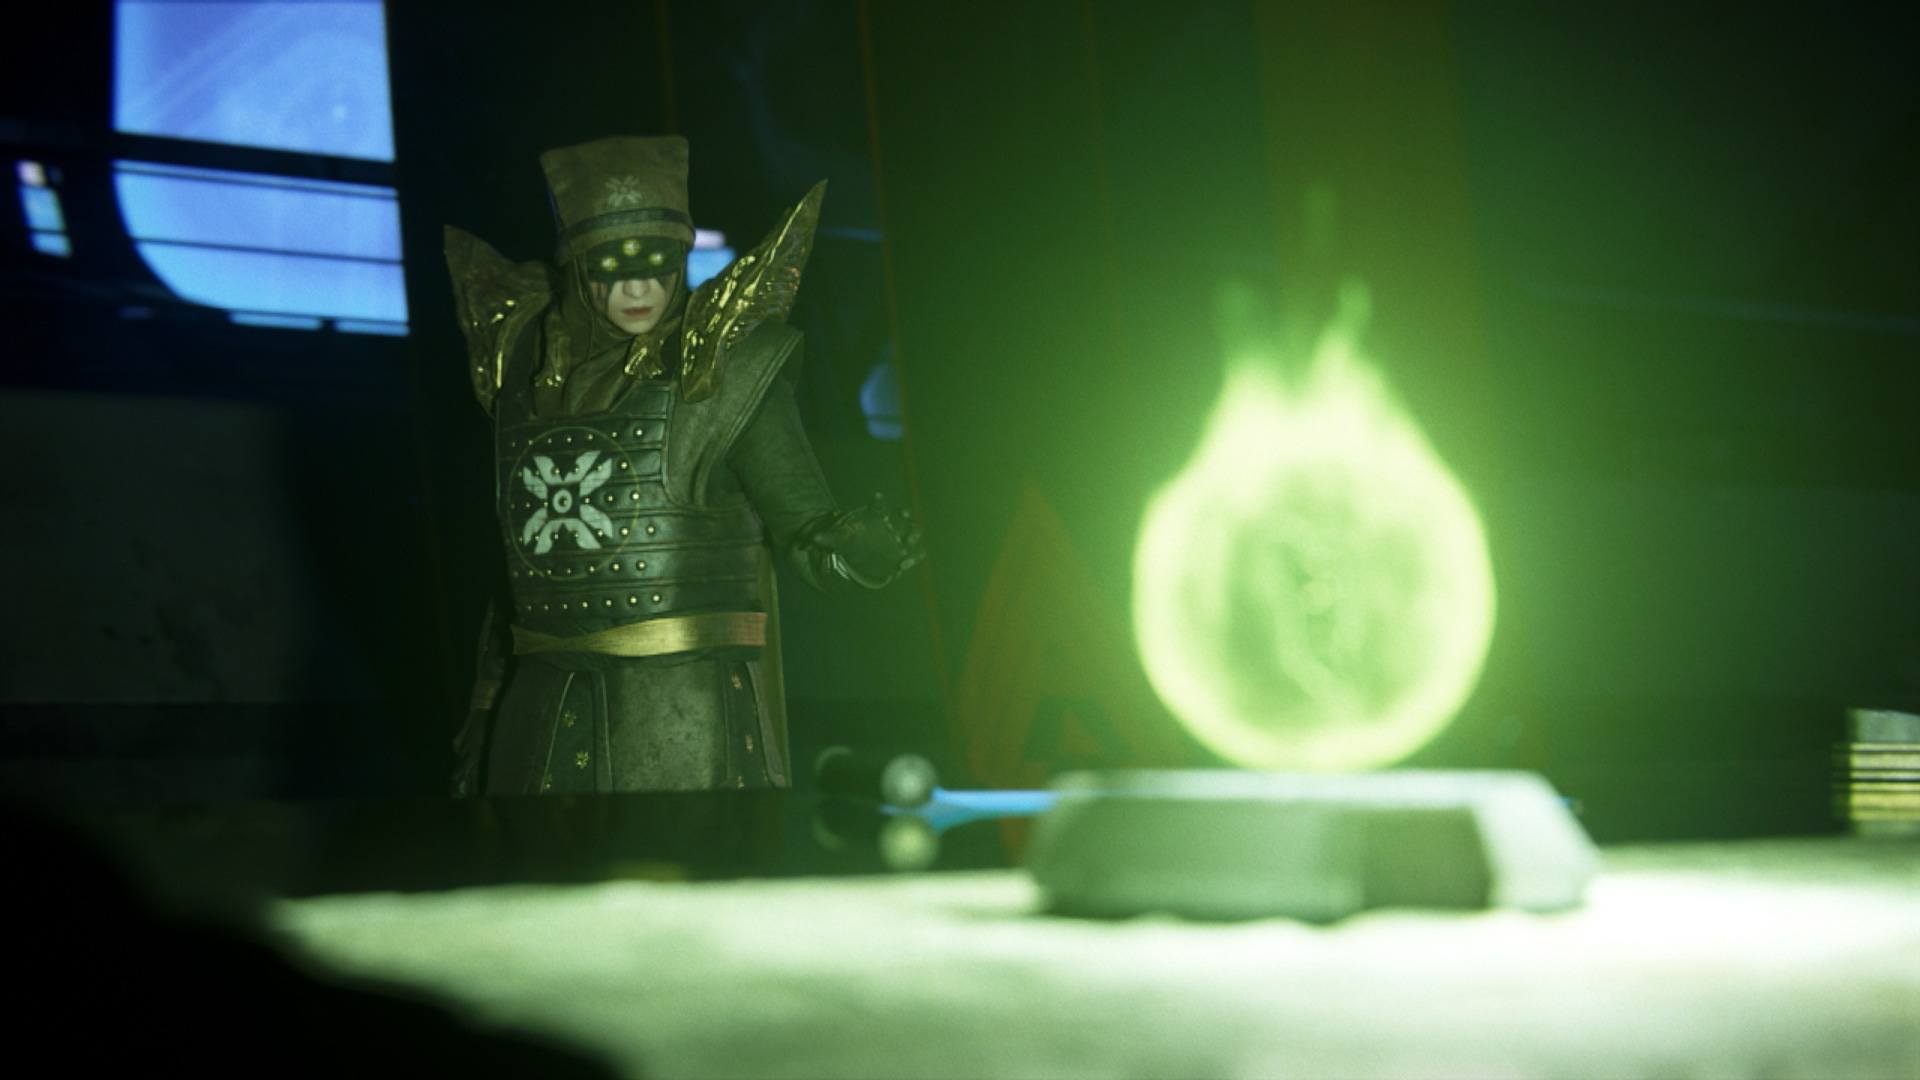 The Taken King brings something Destiny desperately needed: A story